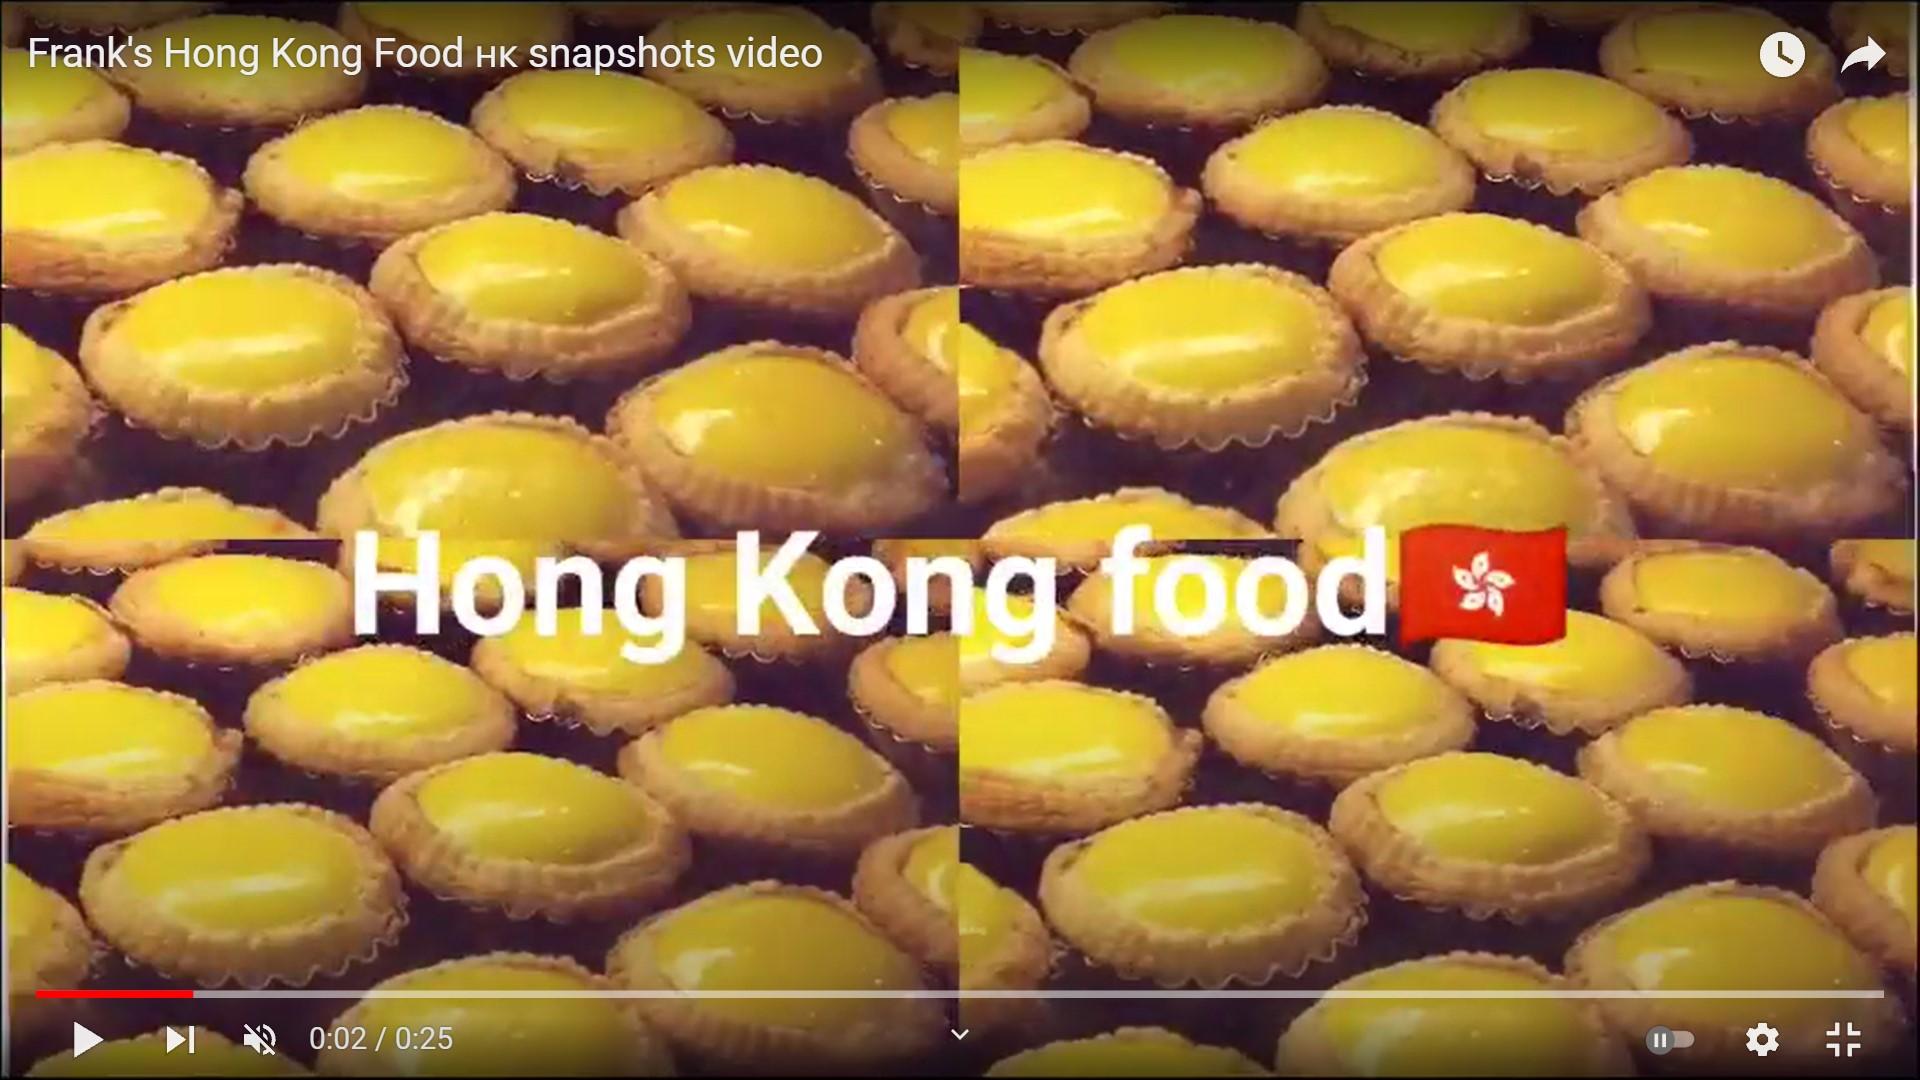 Hong Kong food snapshots video of Frank the tour guide